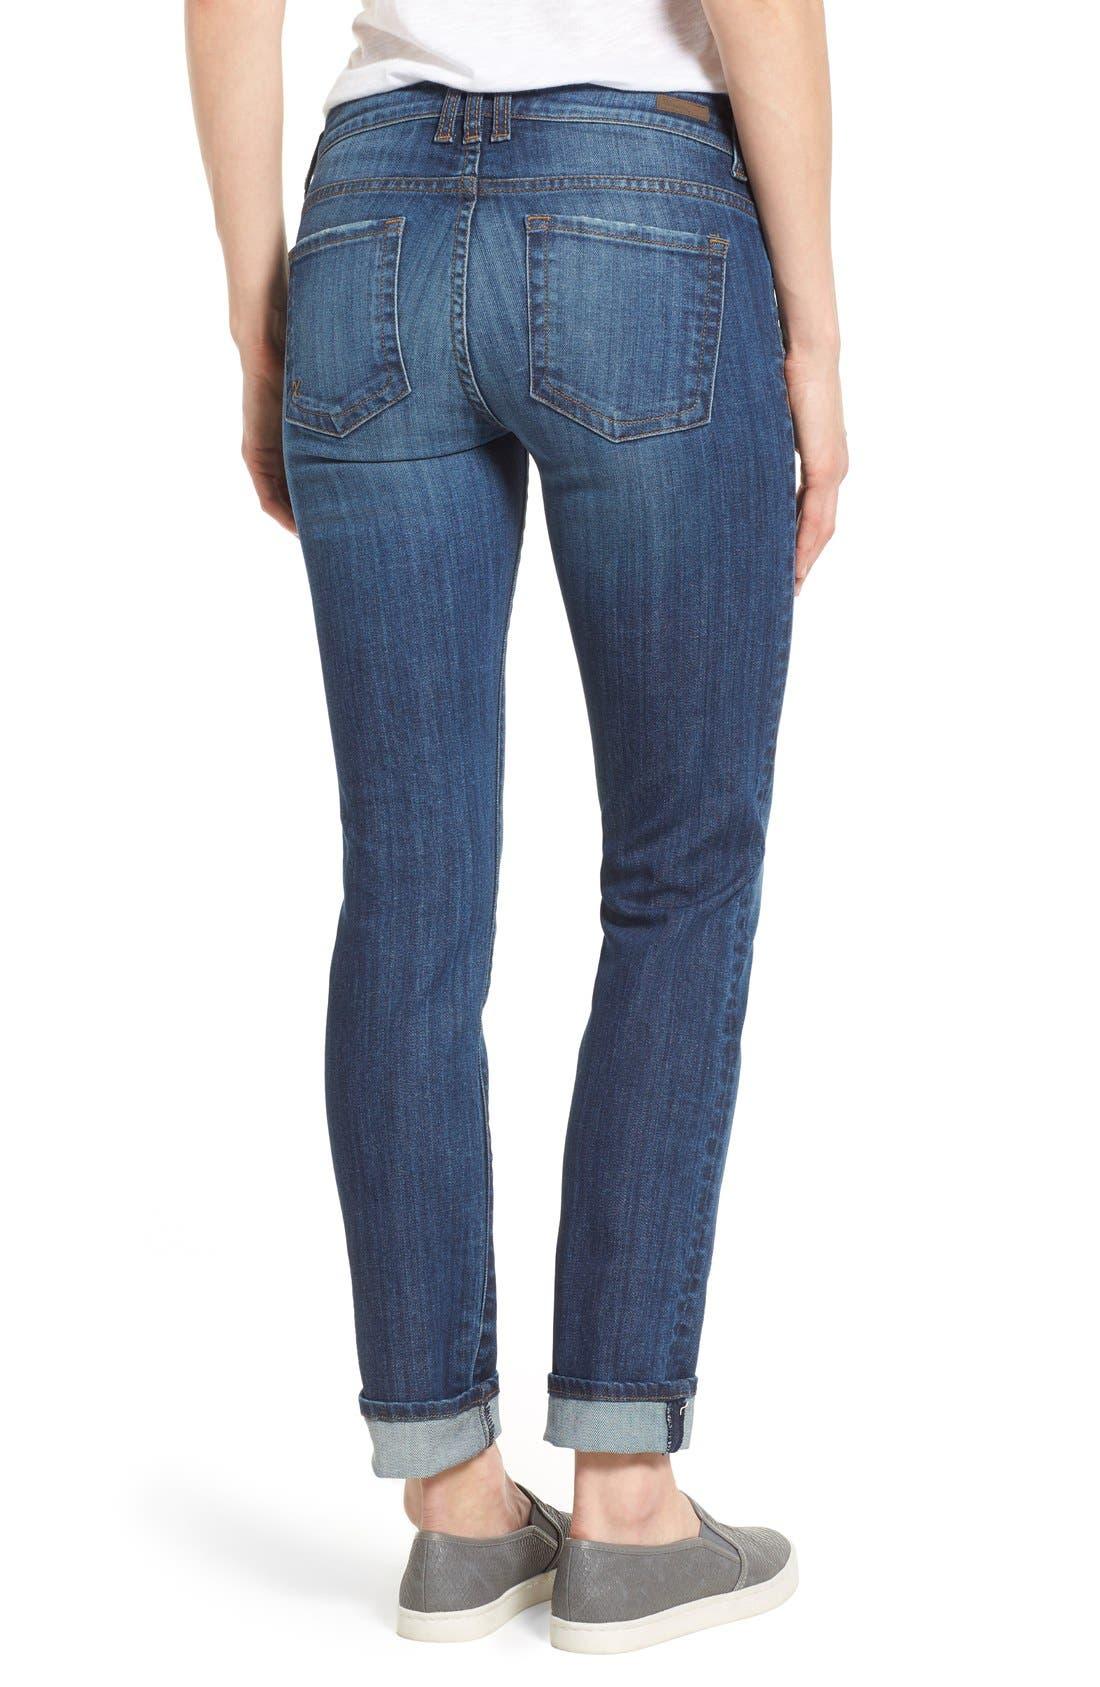 Alternate Image 2  - KUT from the Kloth 'Catherine' Distressed Stretch Boyfriend Jeans (Yearn) (Regular & Petite)